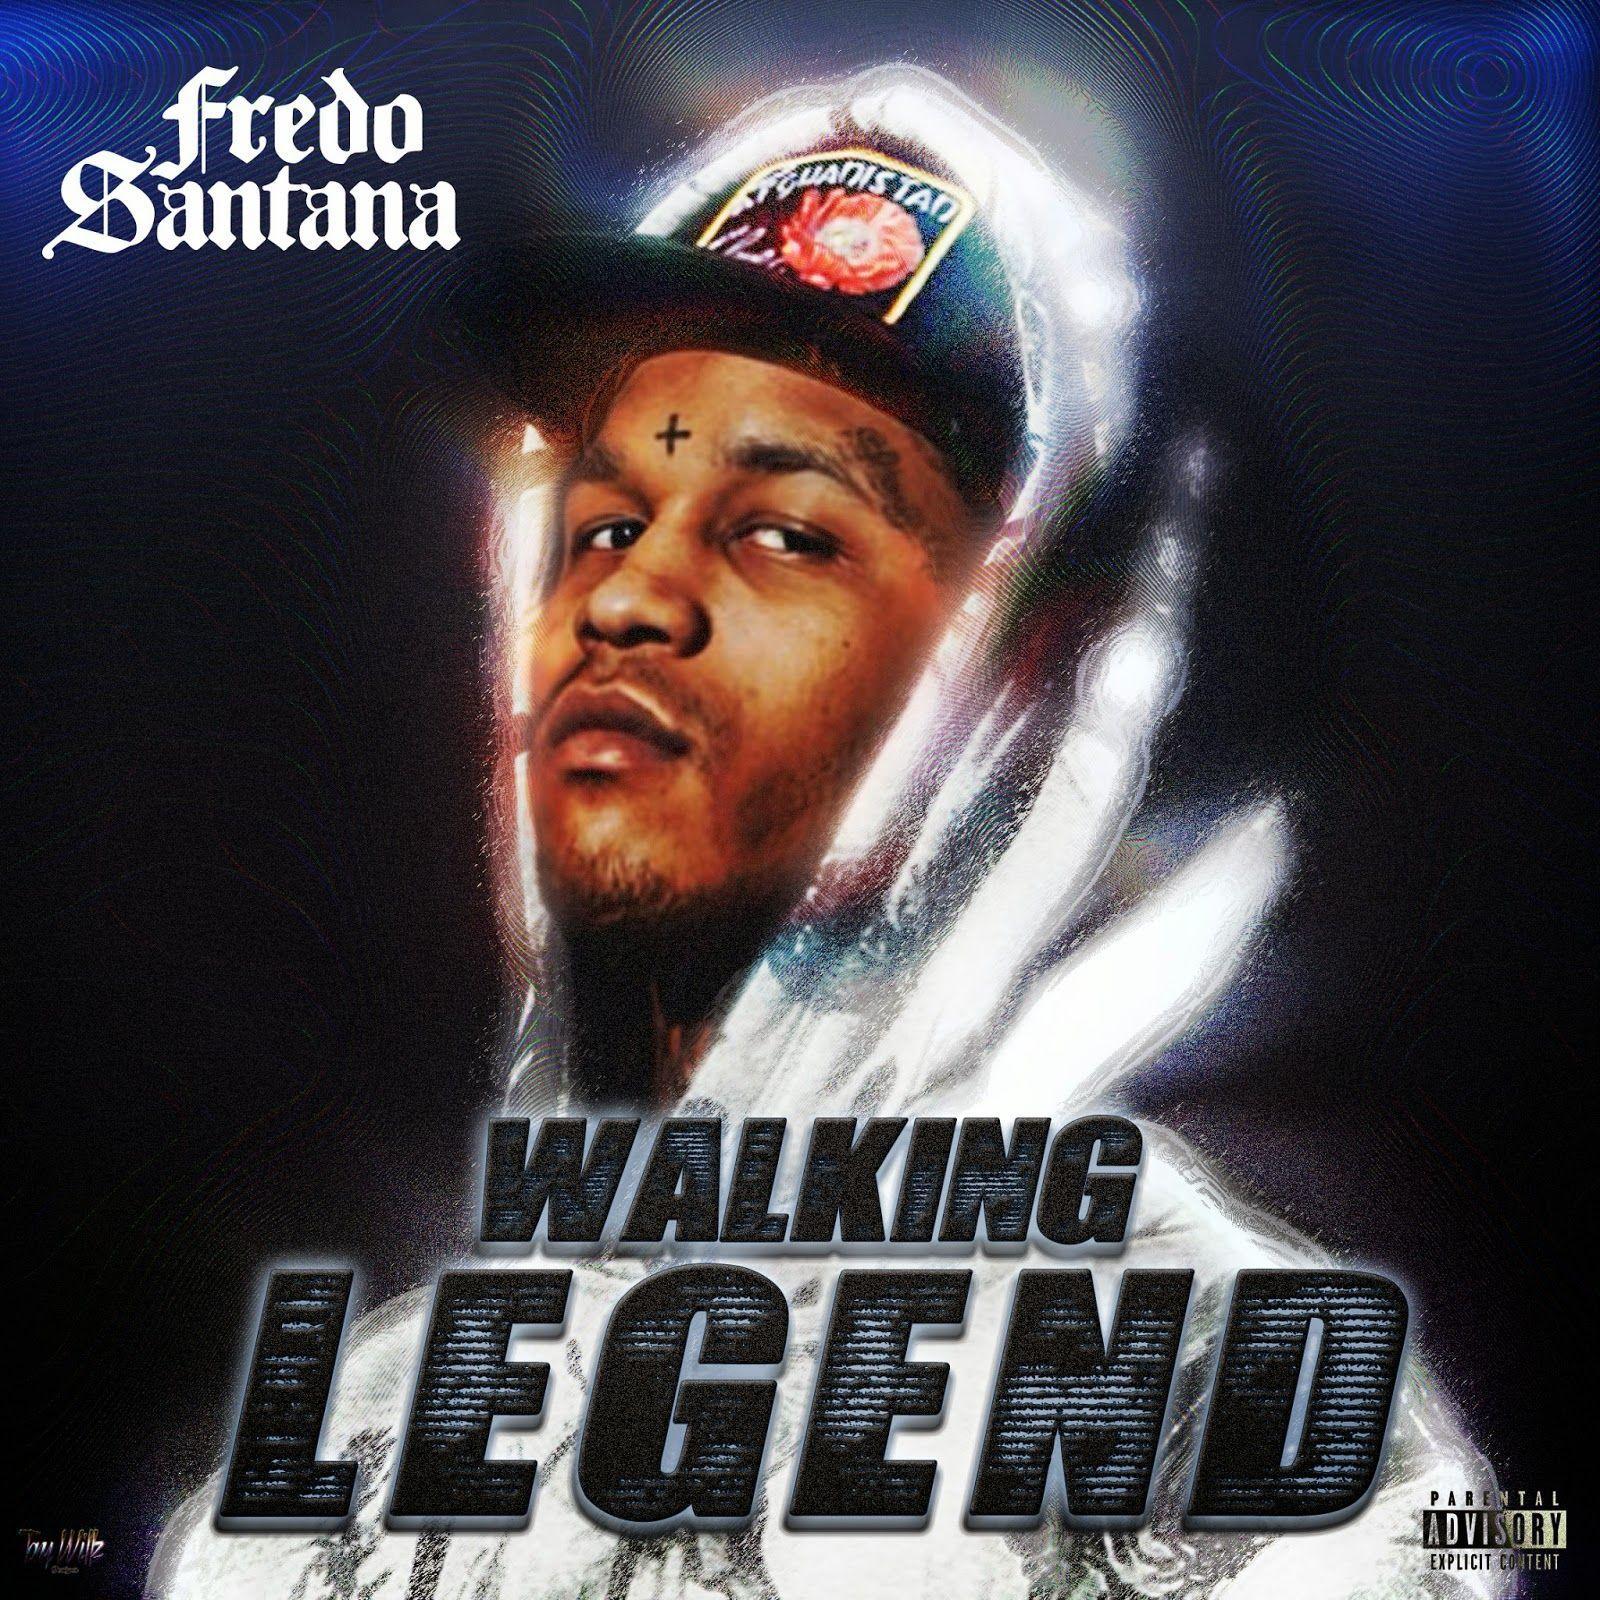 Fredo Santana Wallpaper